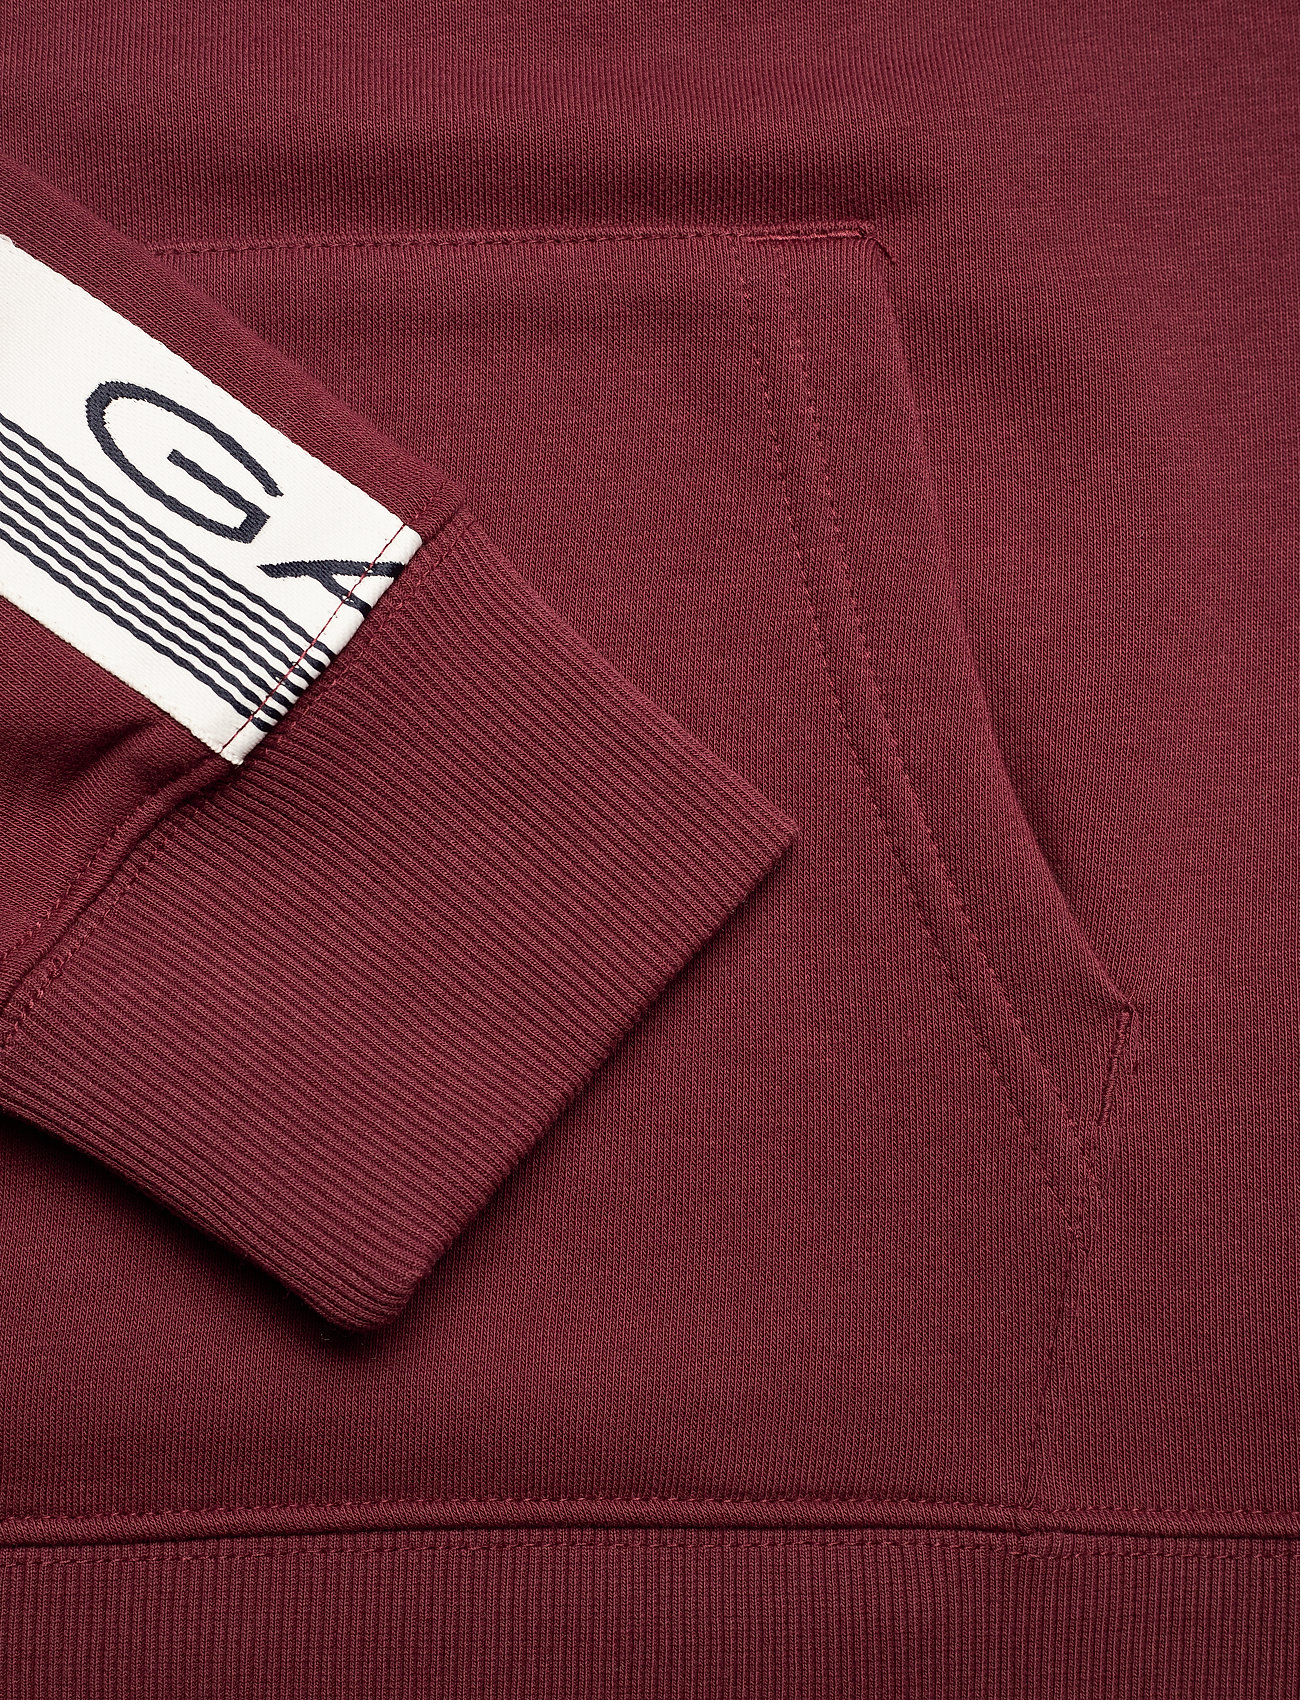 GANT D1. 13 STRIPES SWEAT HOODIE - Sweatshirts PORT RED - Menn Klær